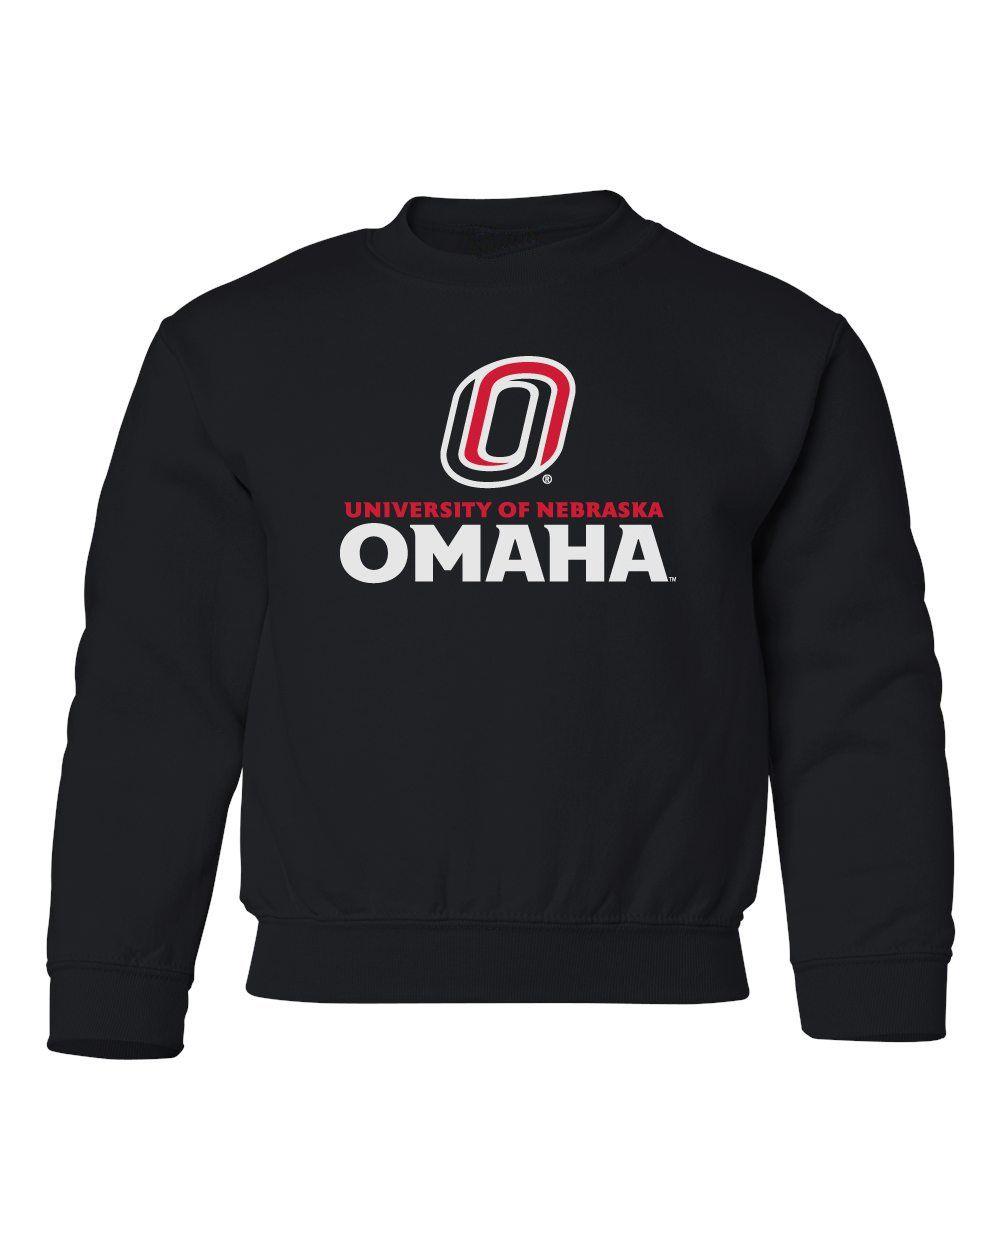 Omaha Mavericks Youth Crewneck Sweatshirt University Of Nebraska Omaha With Primary Logo On Black Omaha Nebraska Crew Neck Sweatshirt Sweatshirts [ 1250 x 1000 Pixel ]